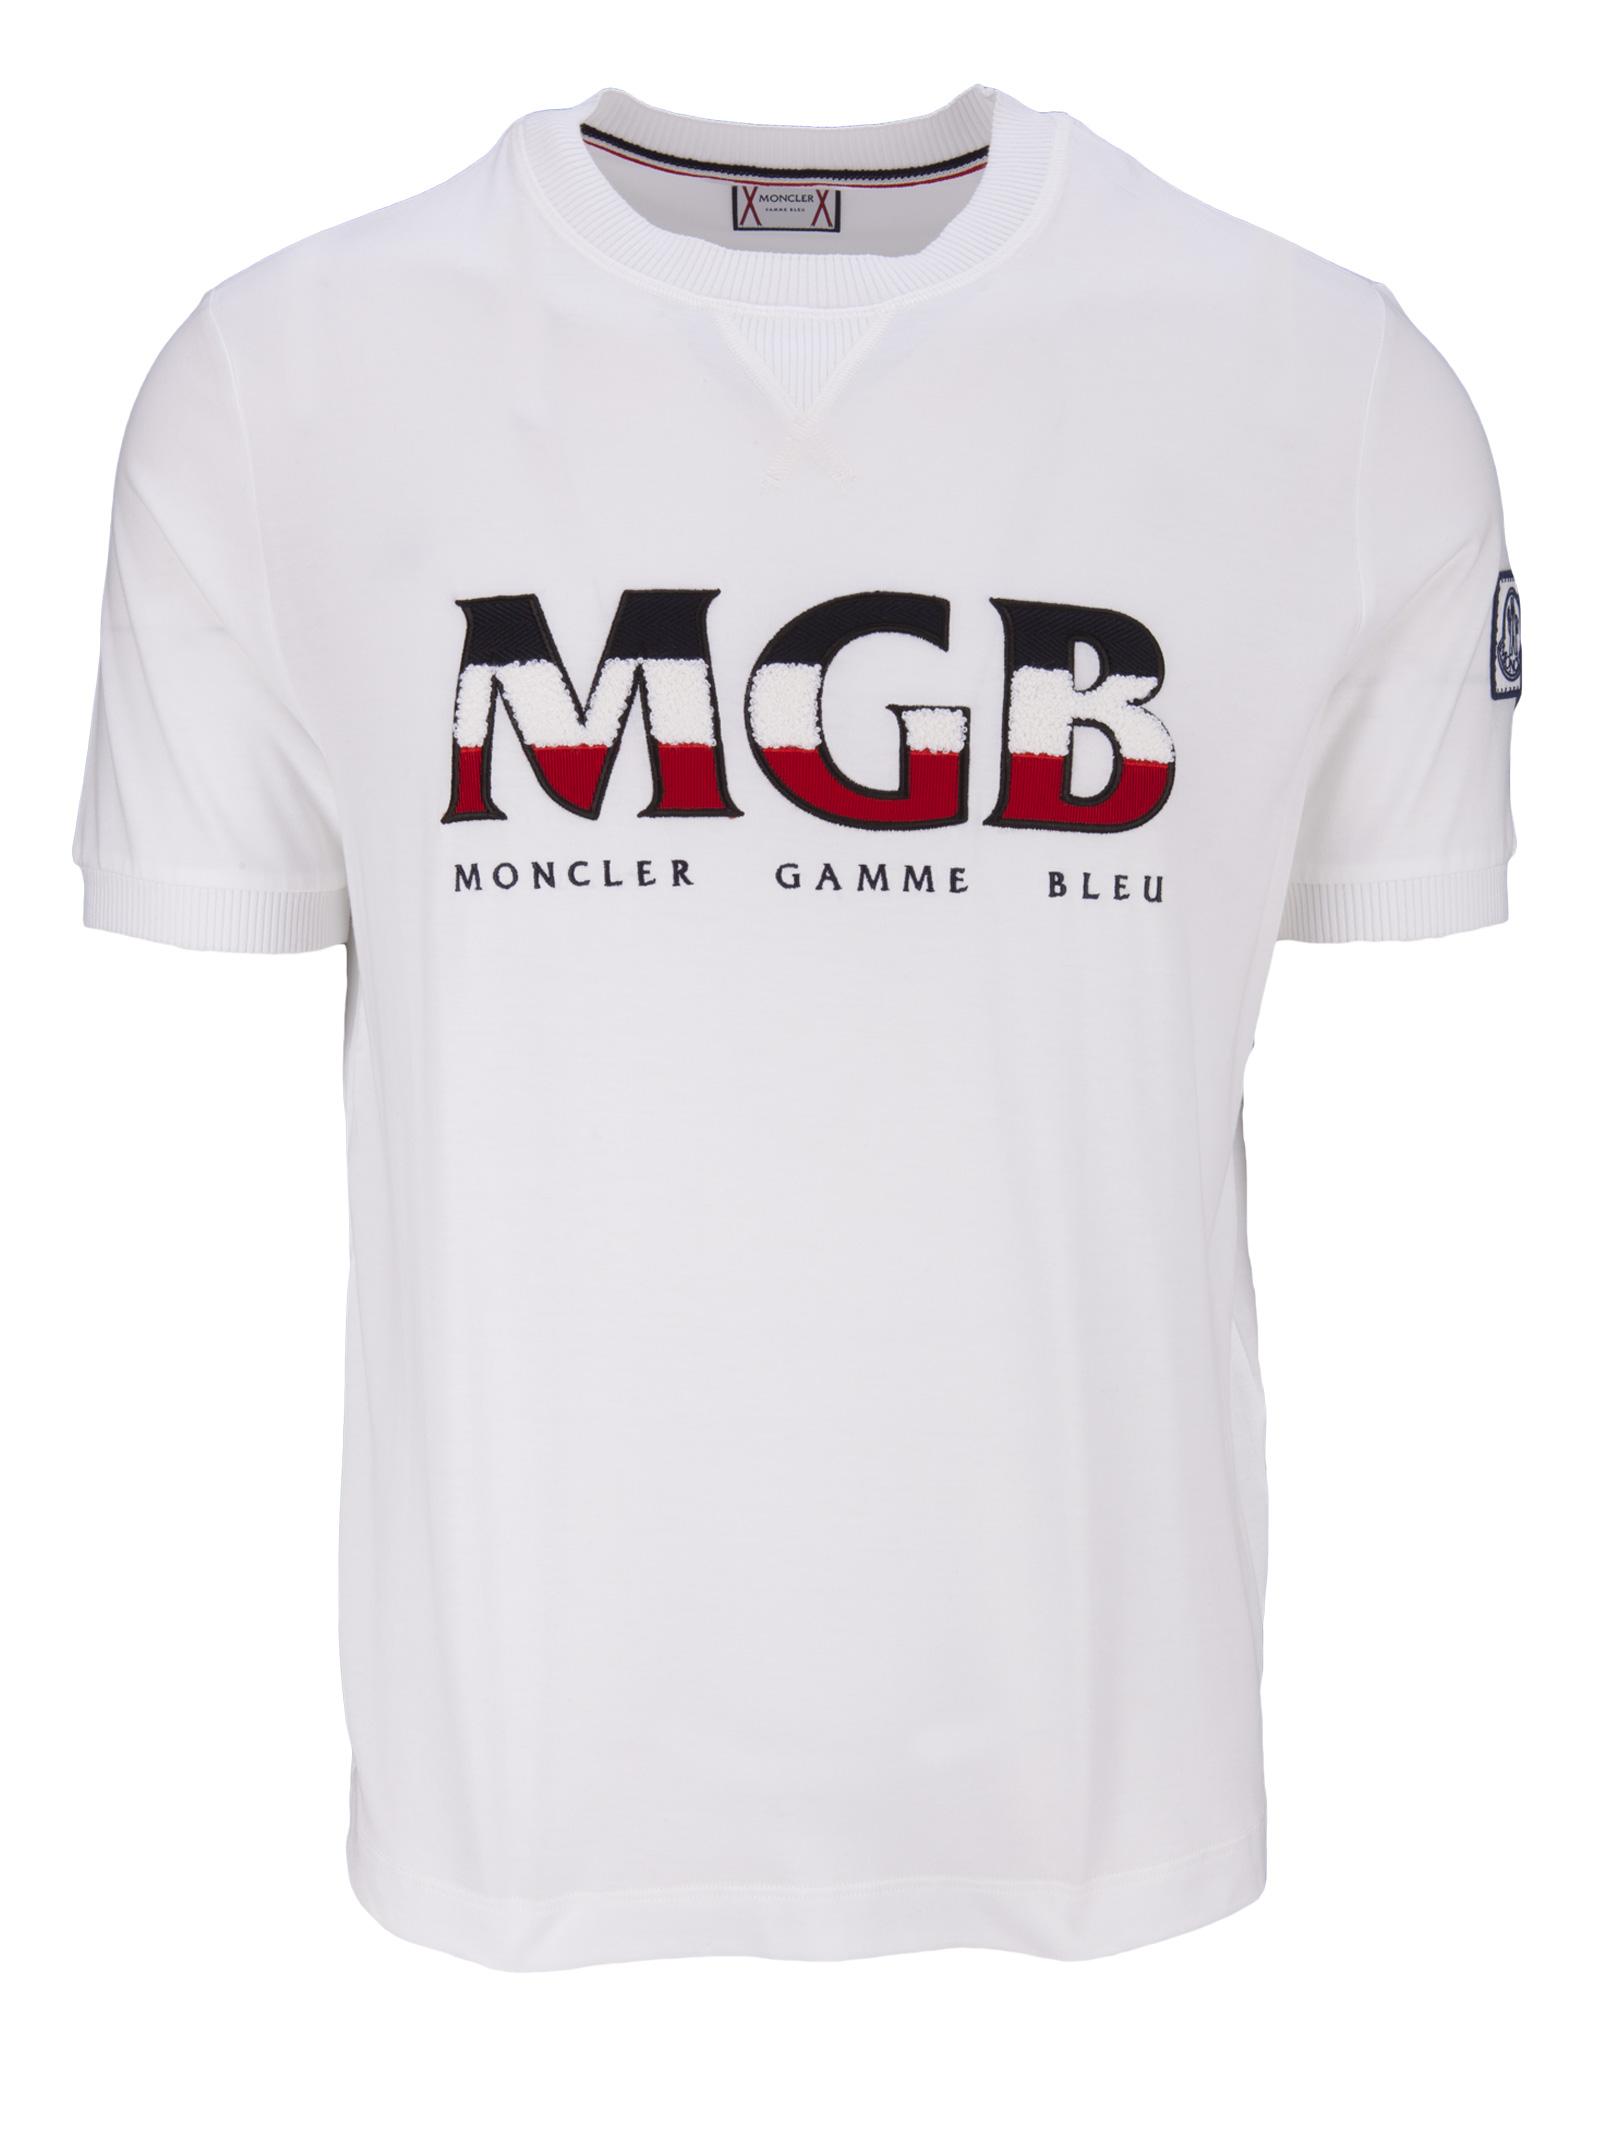 T-shirt Moncler G. B.